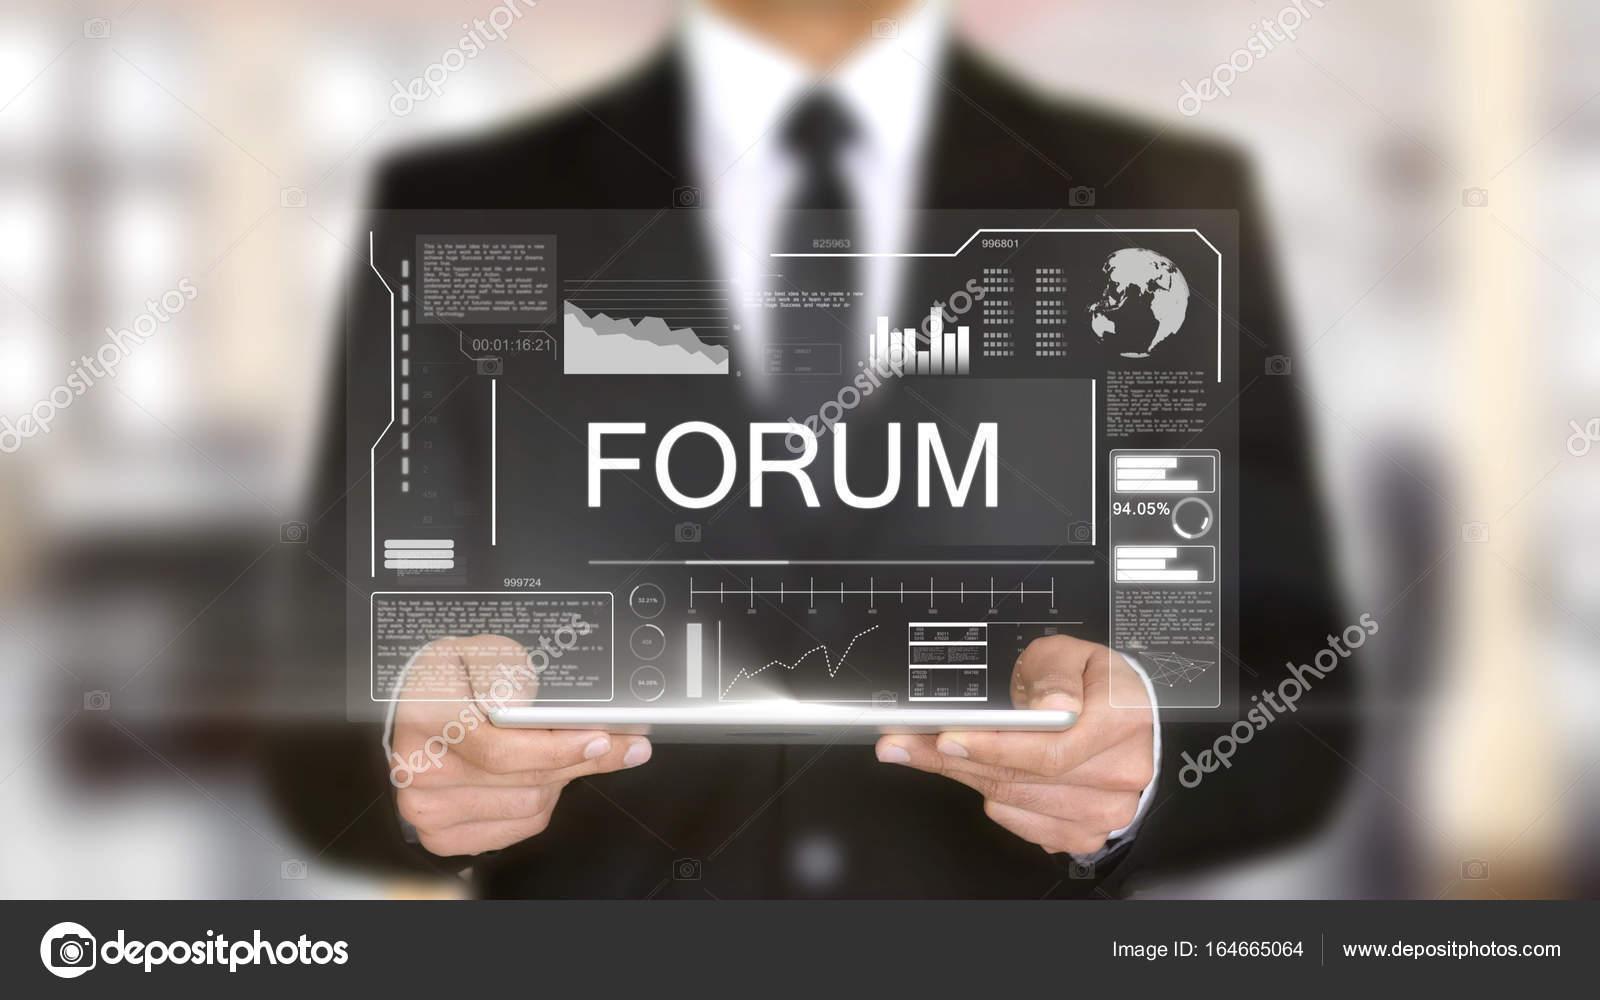 Forum, Hologram Futuristic Interface, Augmented Virtual Reality